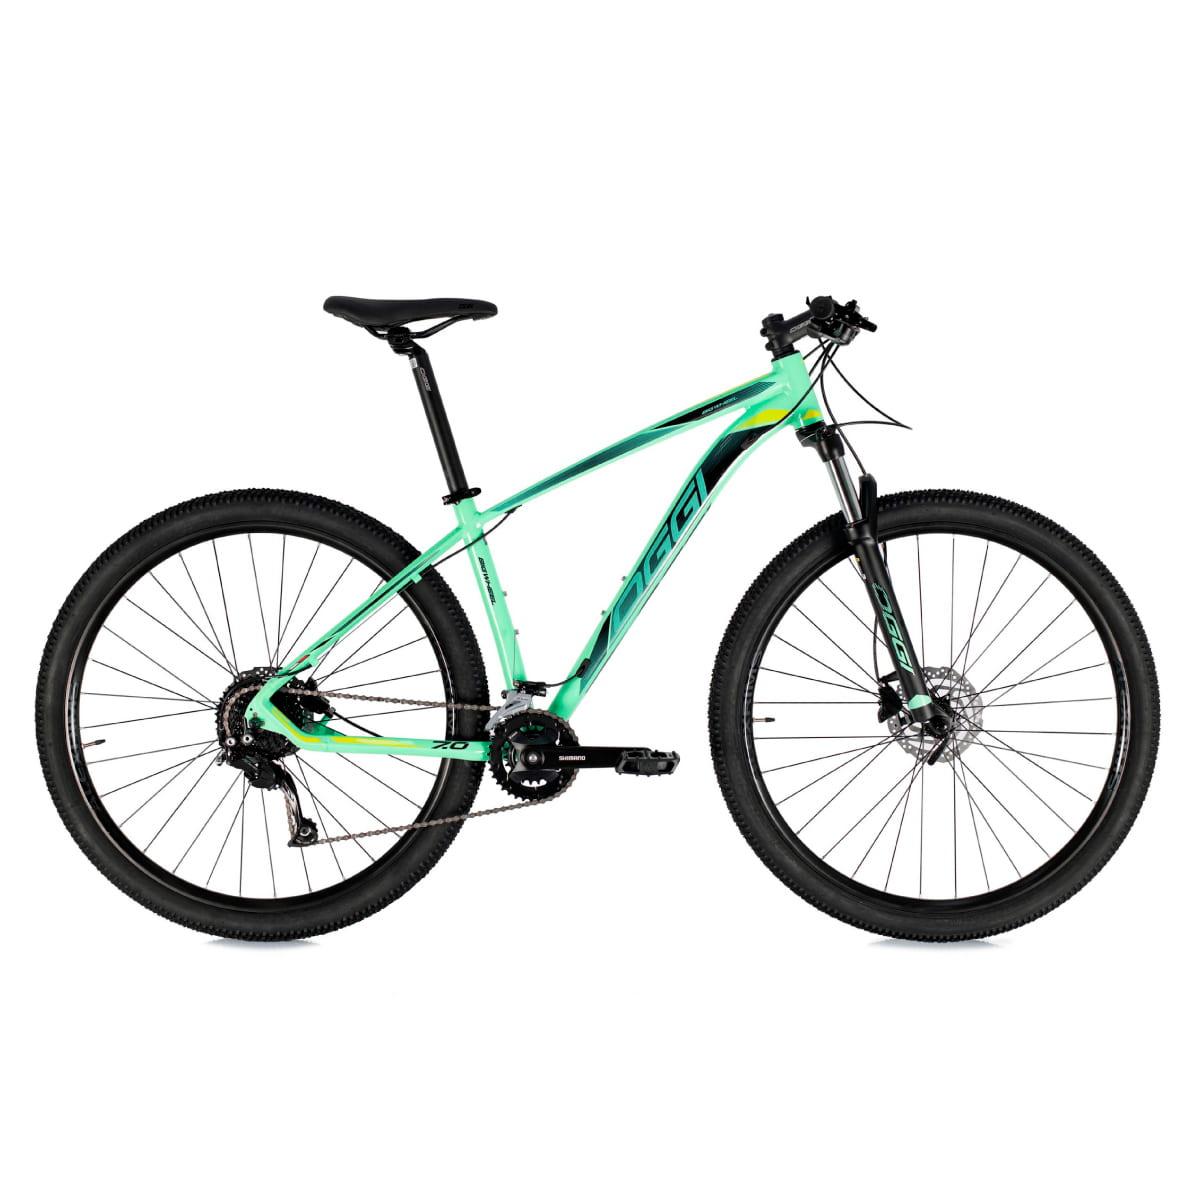 Bike Oggi 7.0 2021 Big Whell 18 V Shimano Alivio Verde